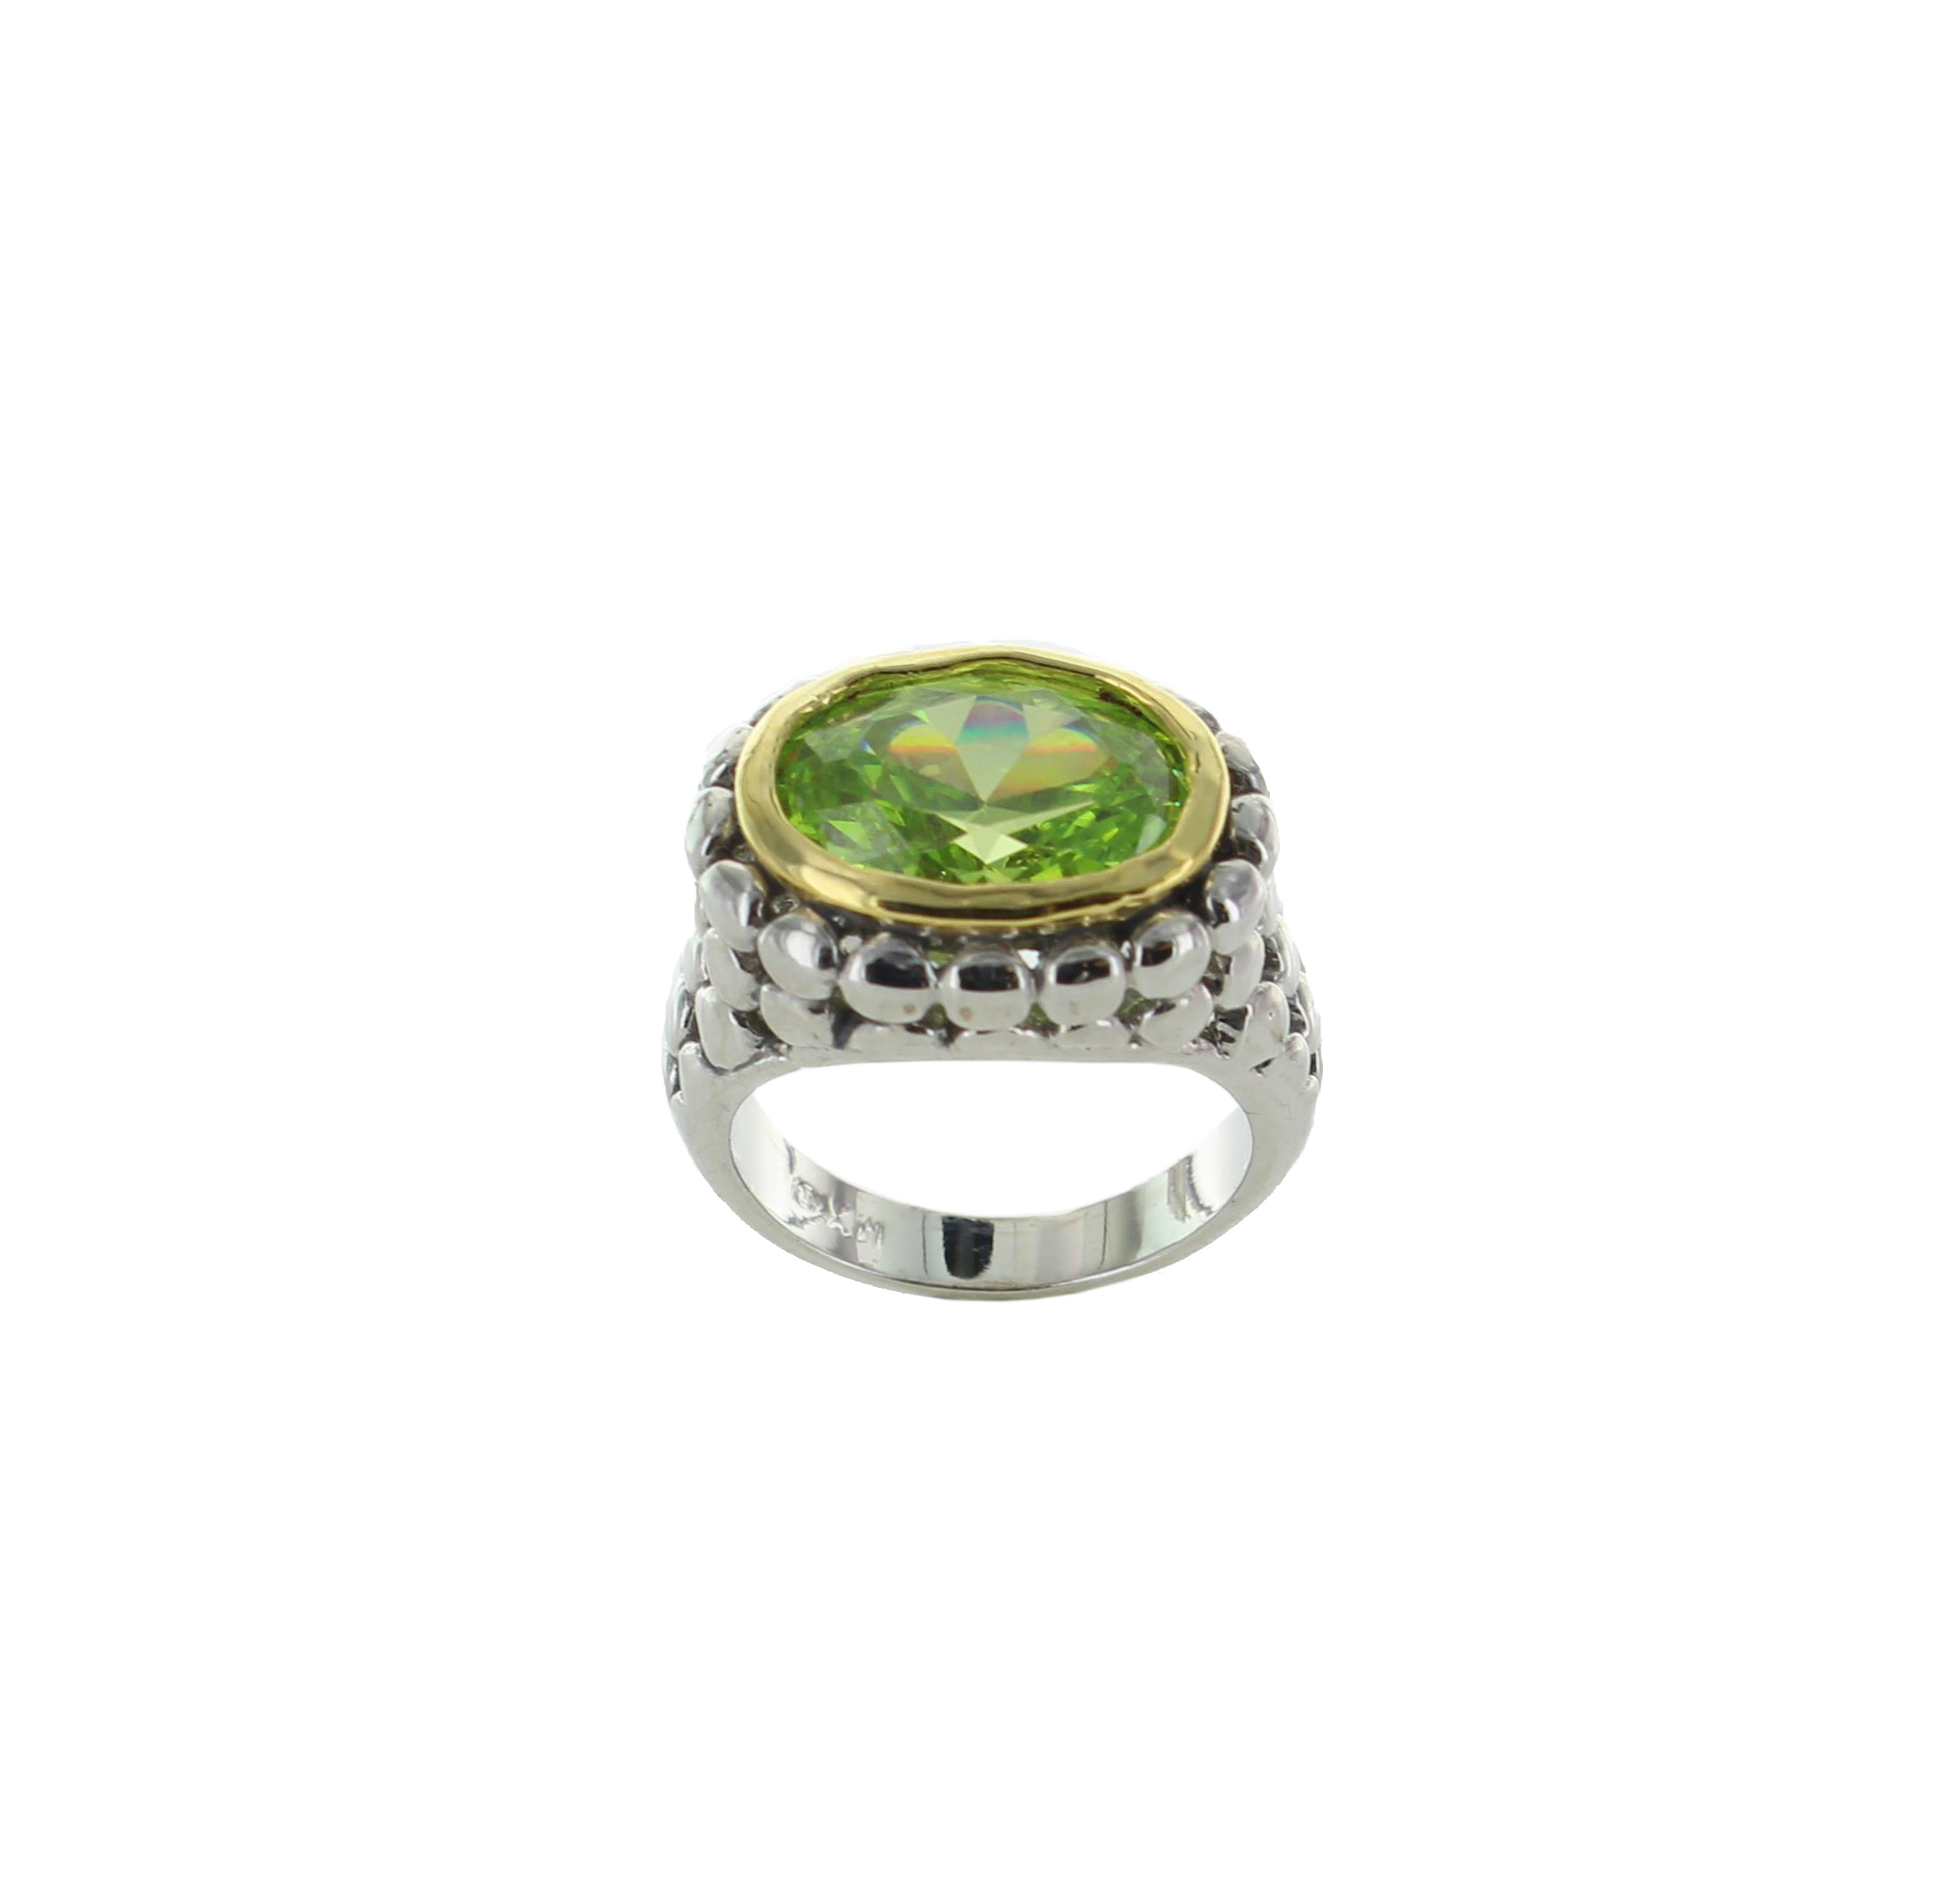 Gemstone shopping online